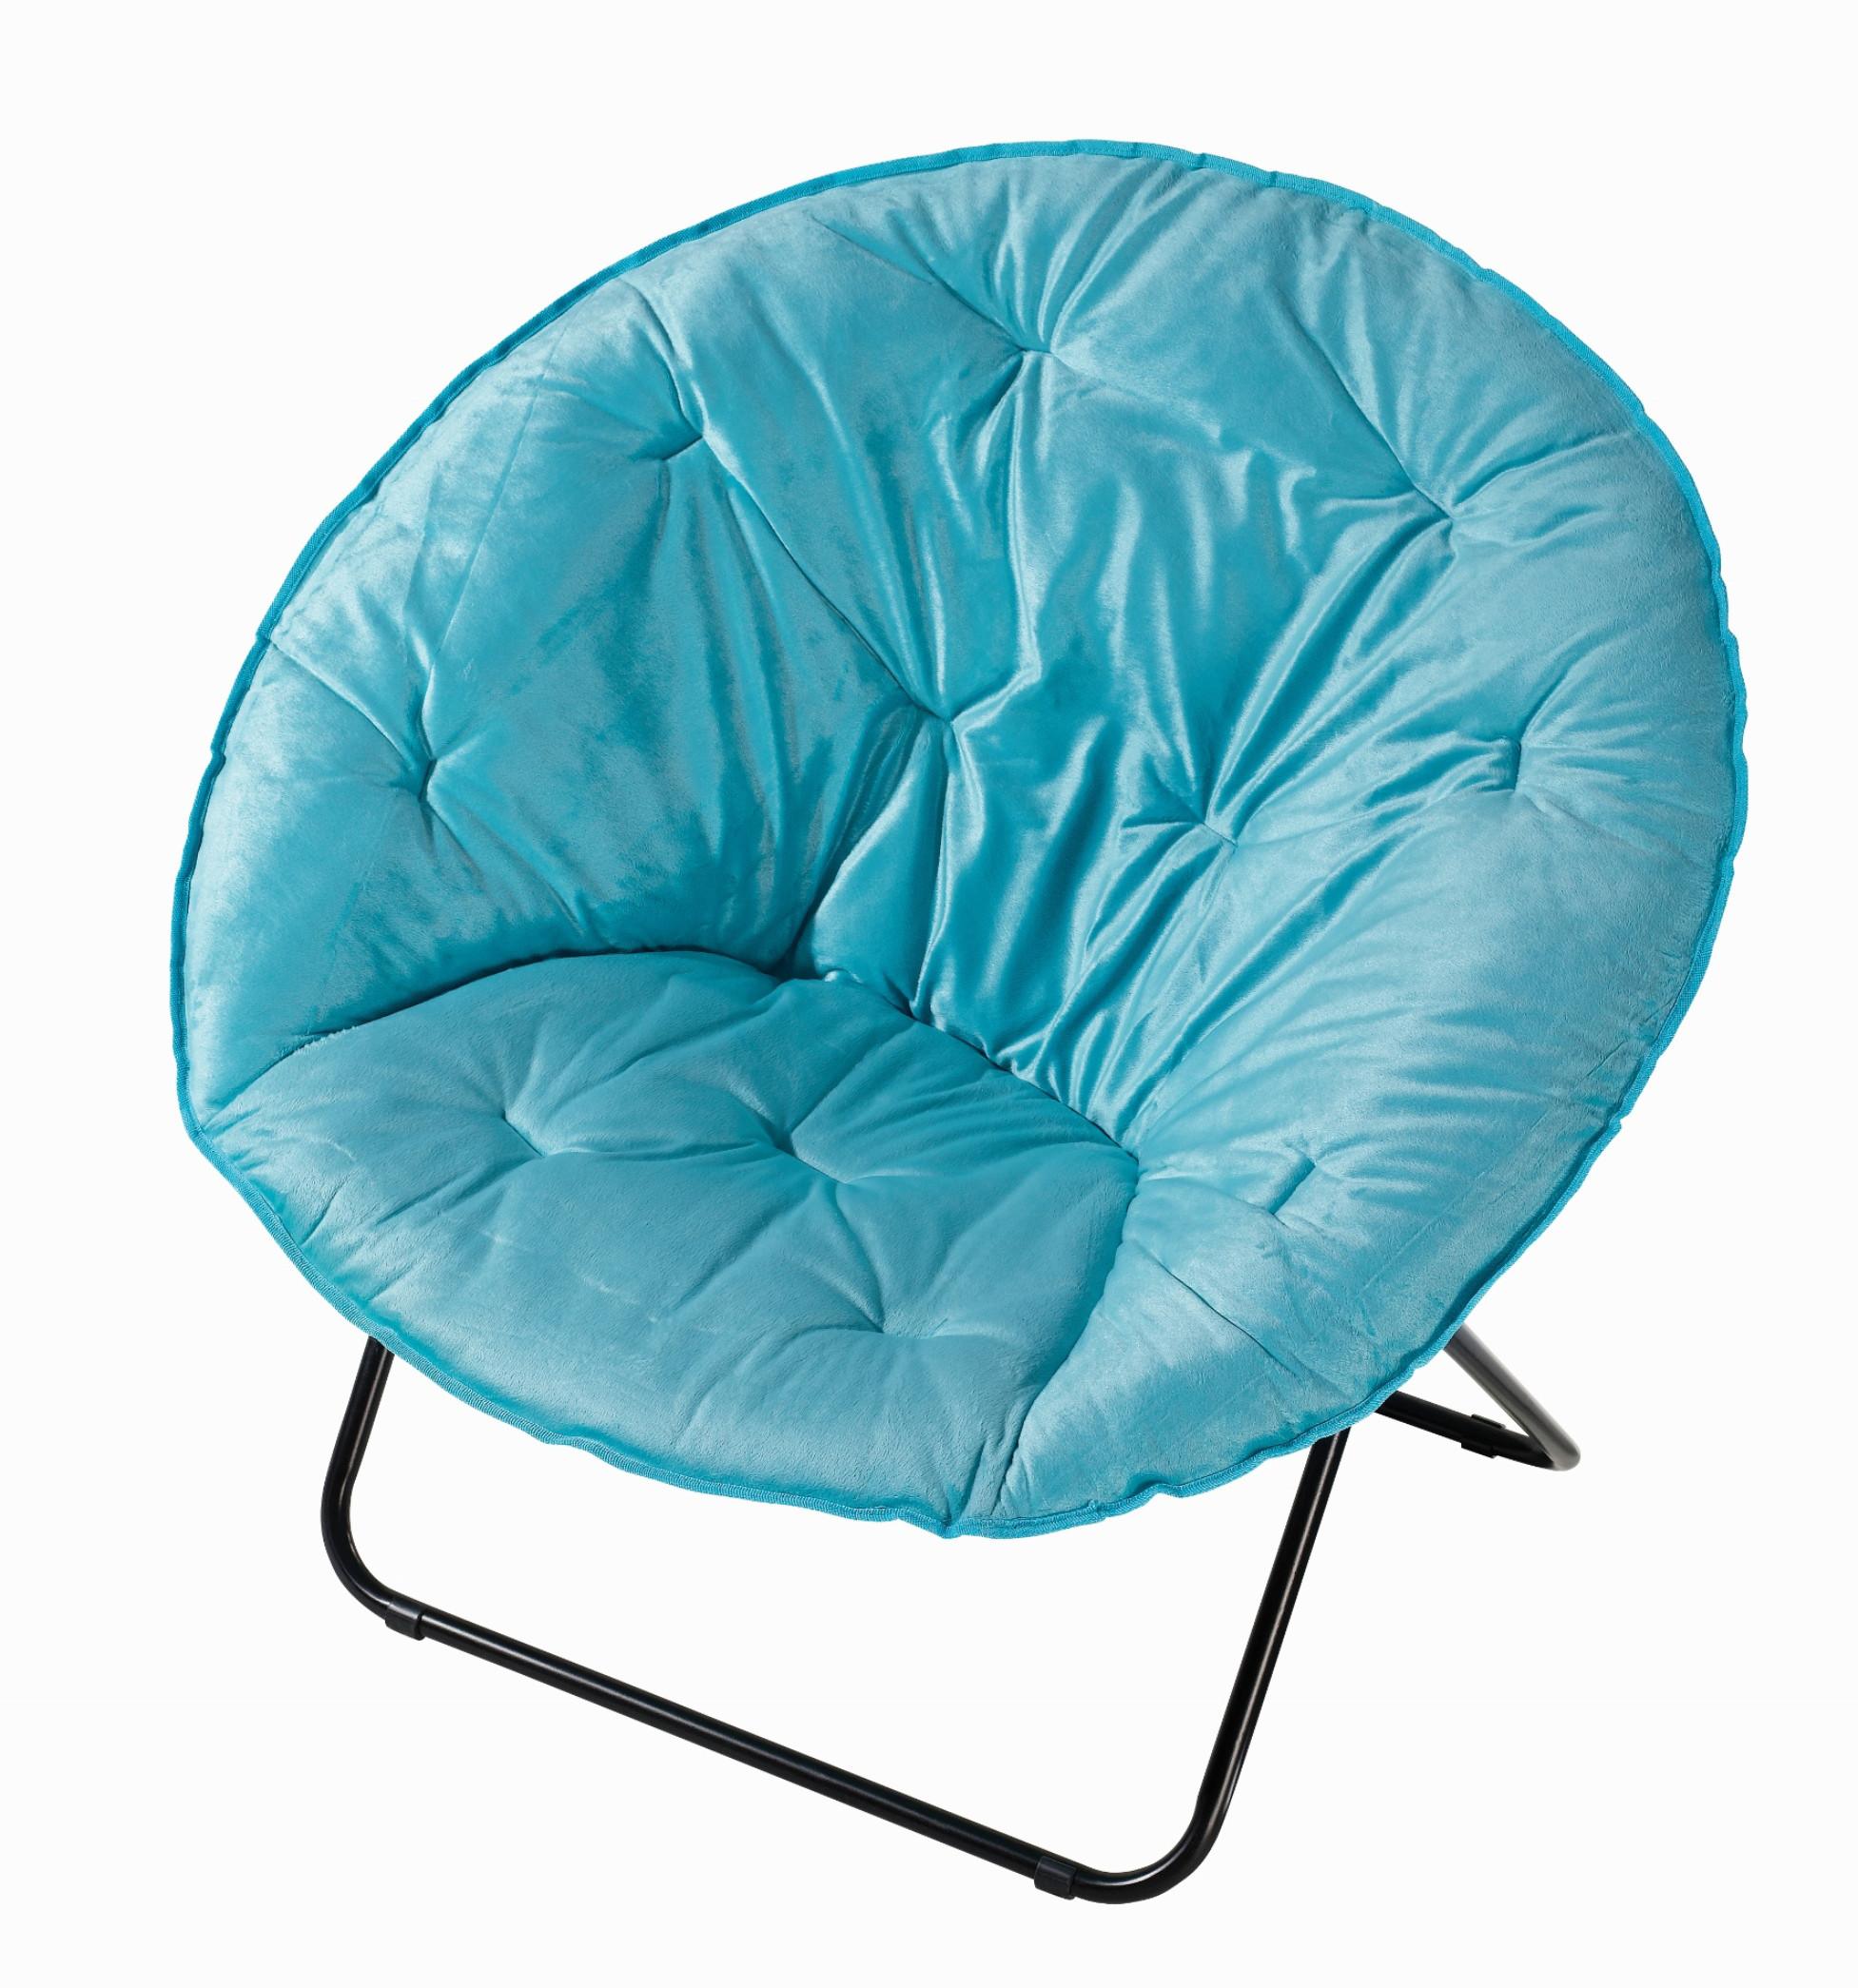 Kids Comfy Chair  Kids fy Chair